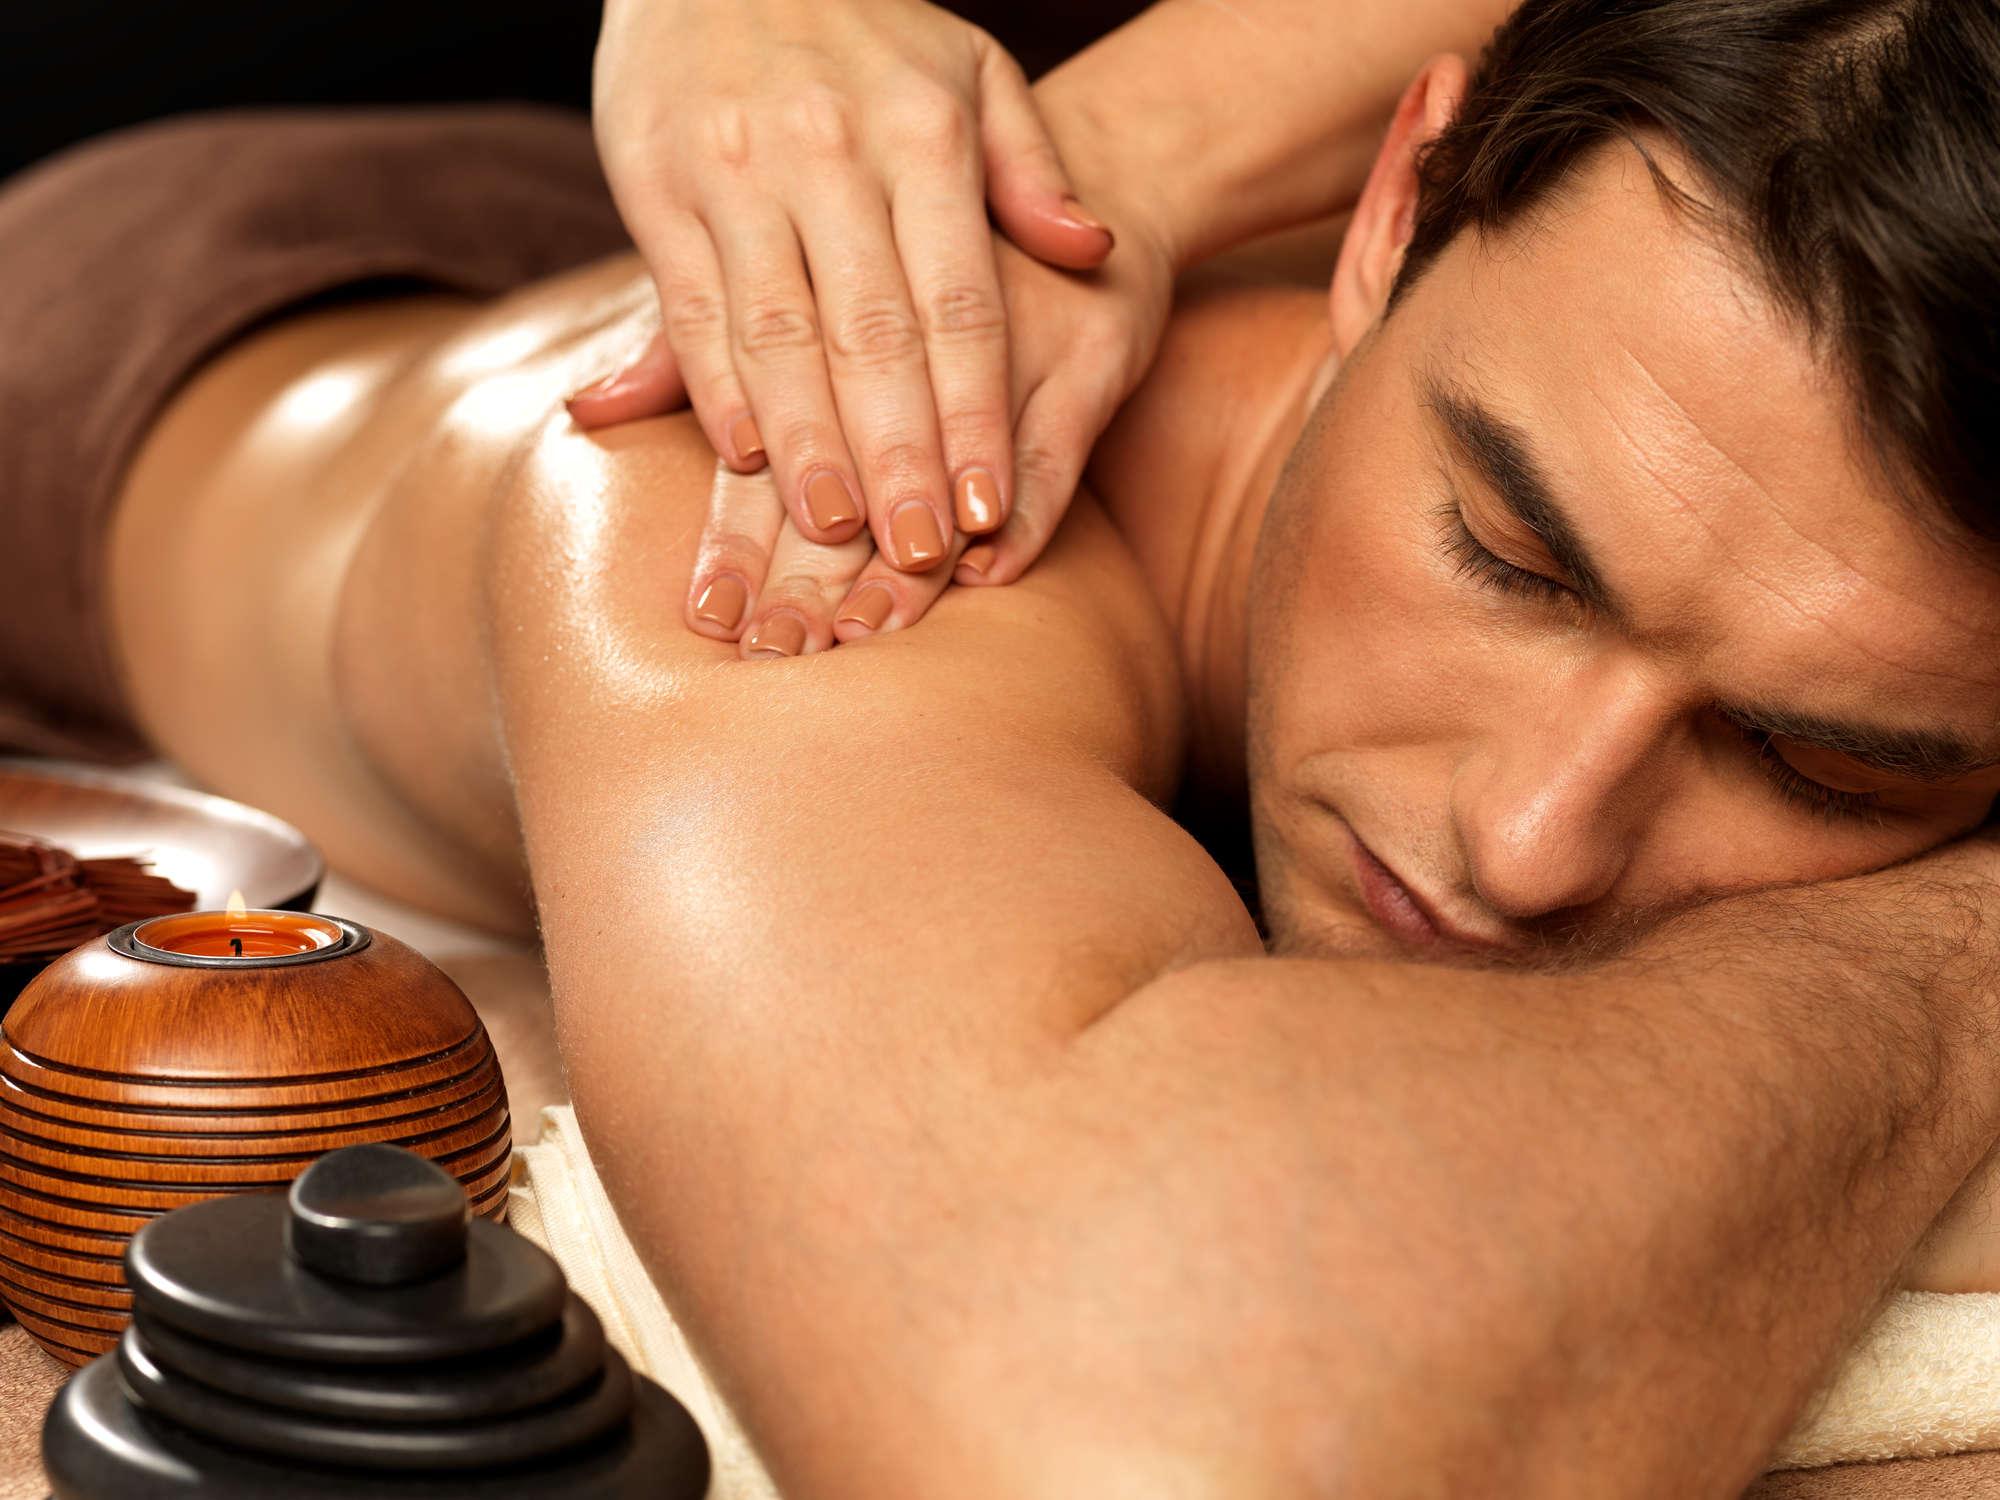 Возбуждающий массаж для мужчины в домашних условиях – техники массажа